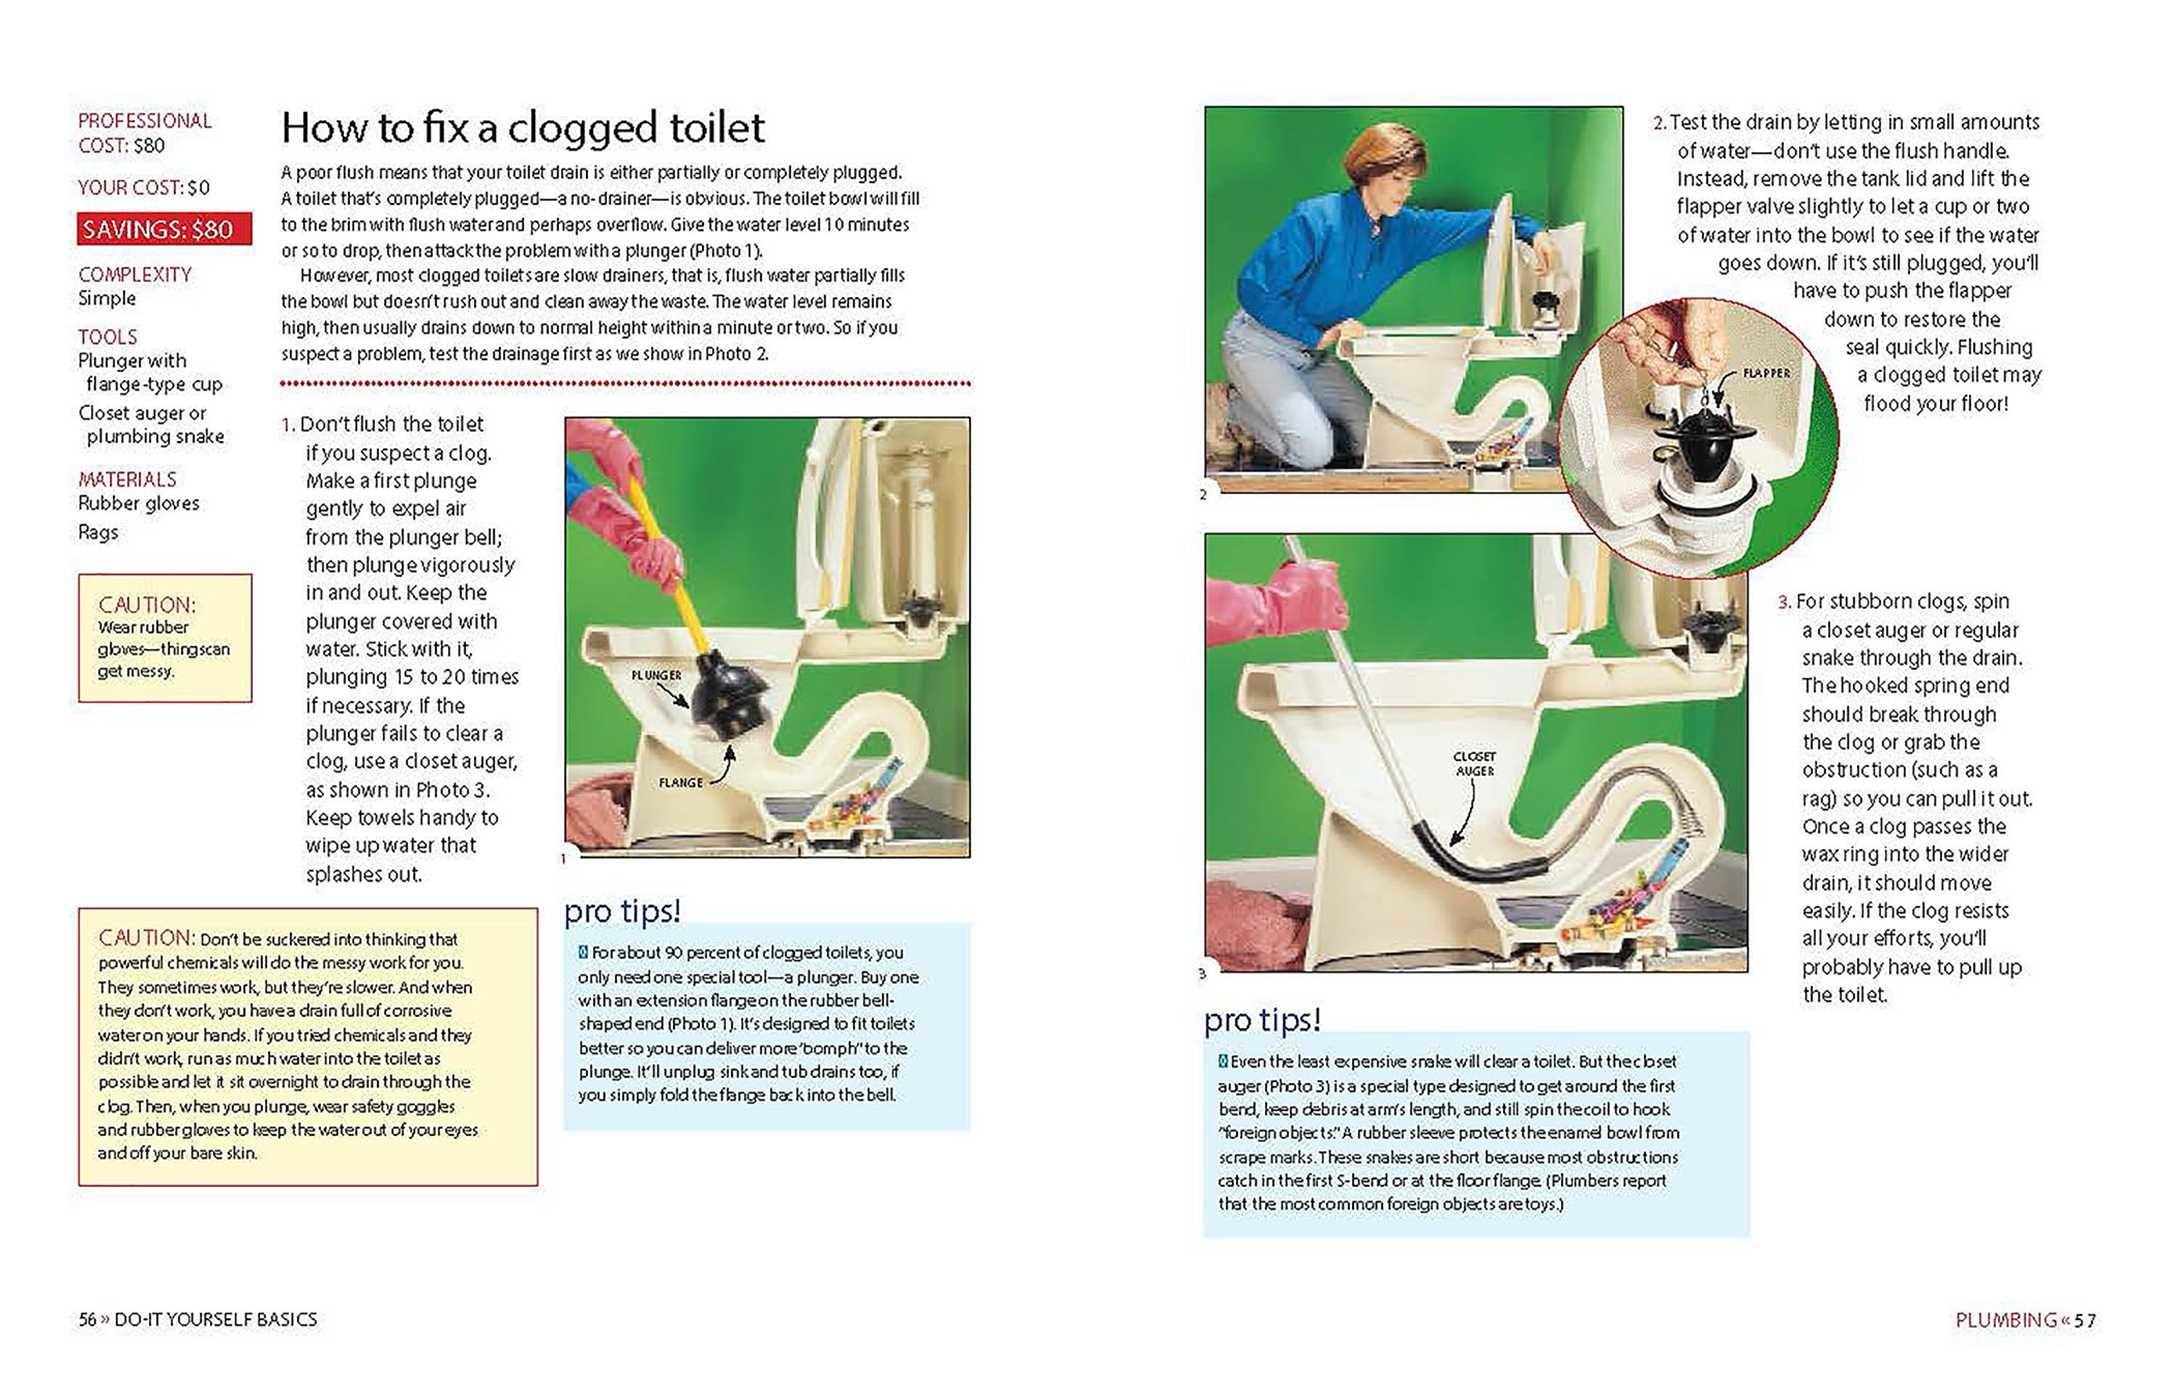 Family handyman do it yourself basics ebook by editors of family family handyman do it yourself basics 978162145353602 solutioingenieria Image collections